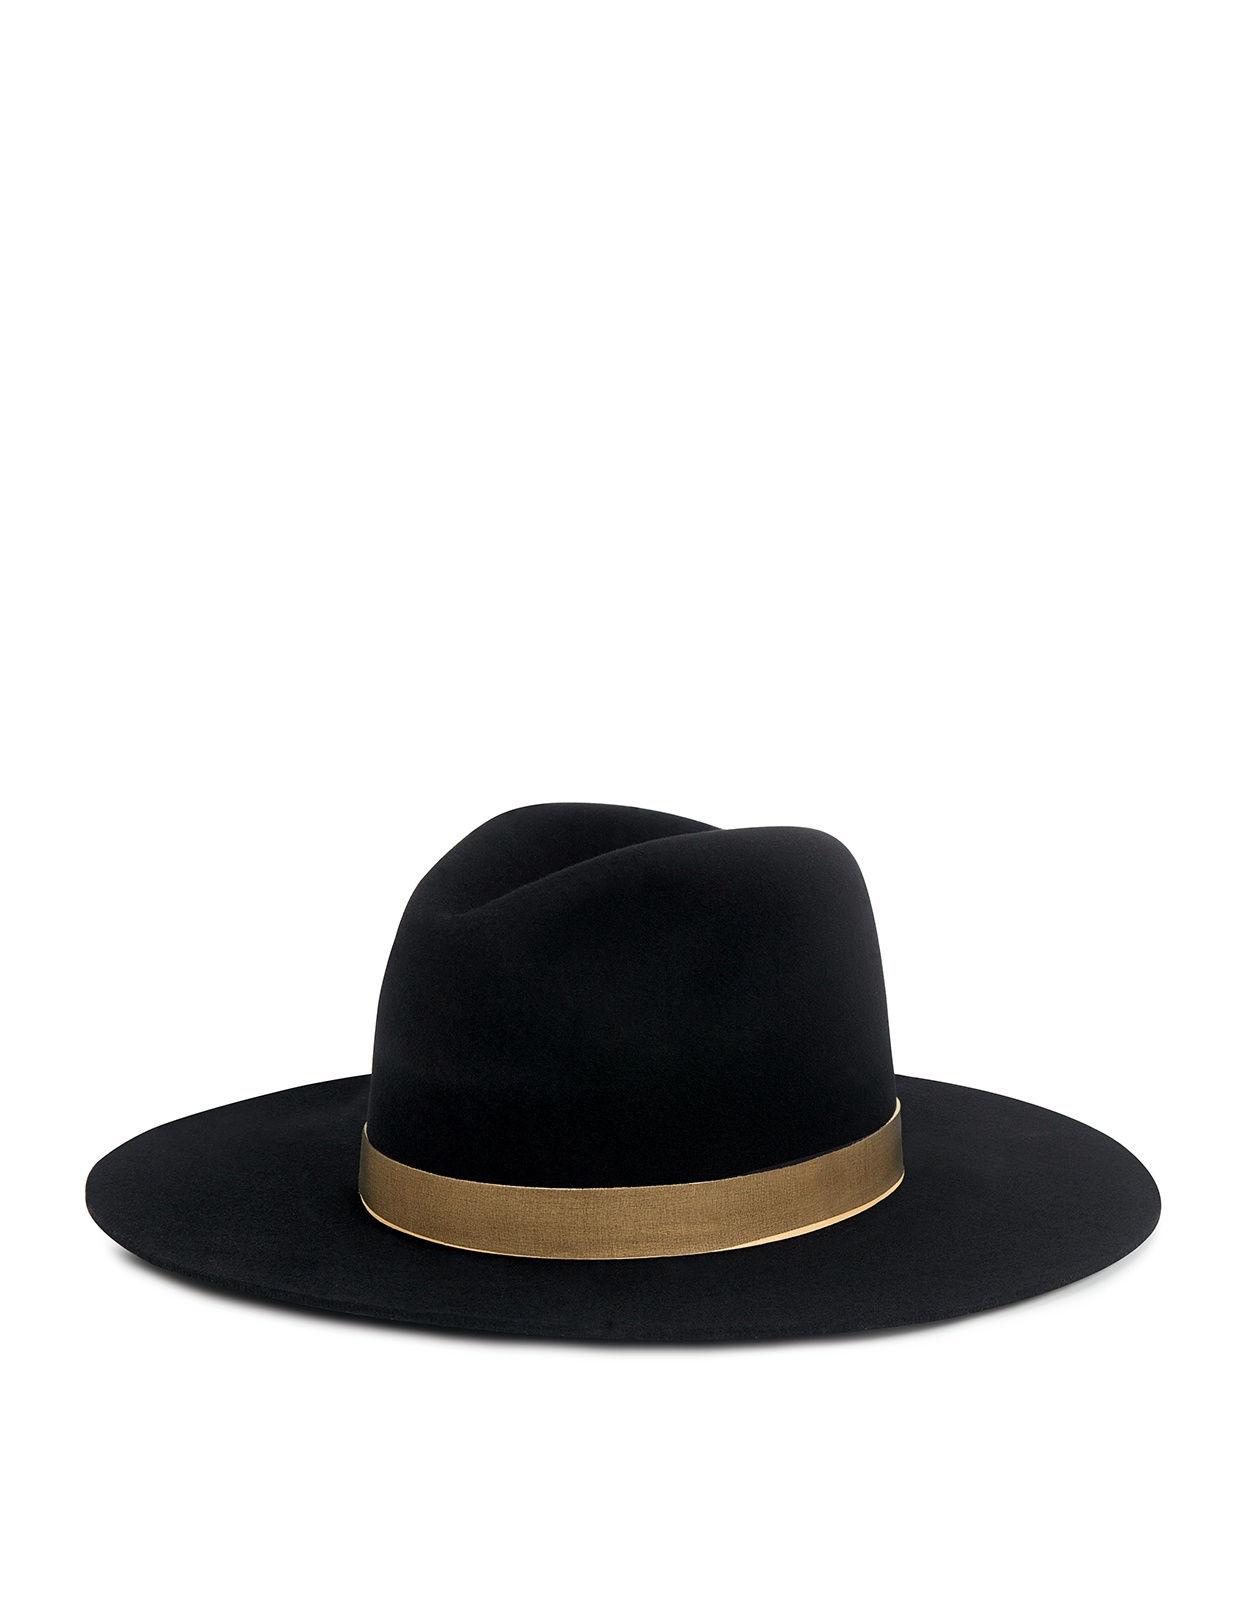 Janessa Leone Georgia Wool Felt Fedora Hat - IFCHIC 0a735c920344